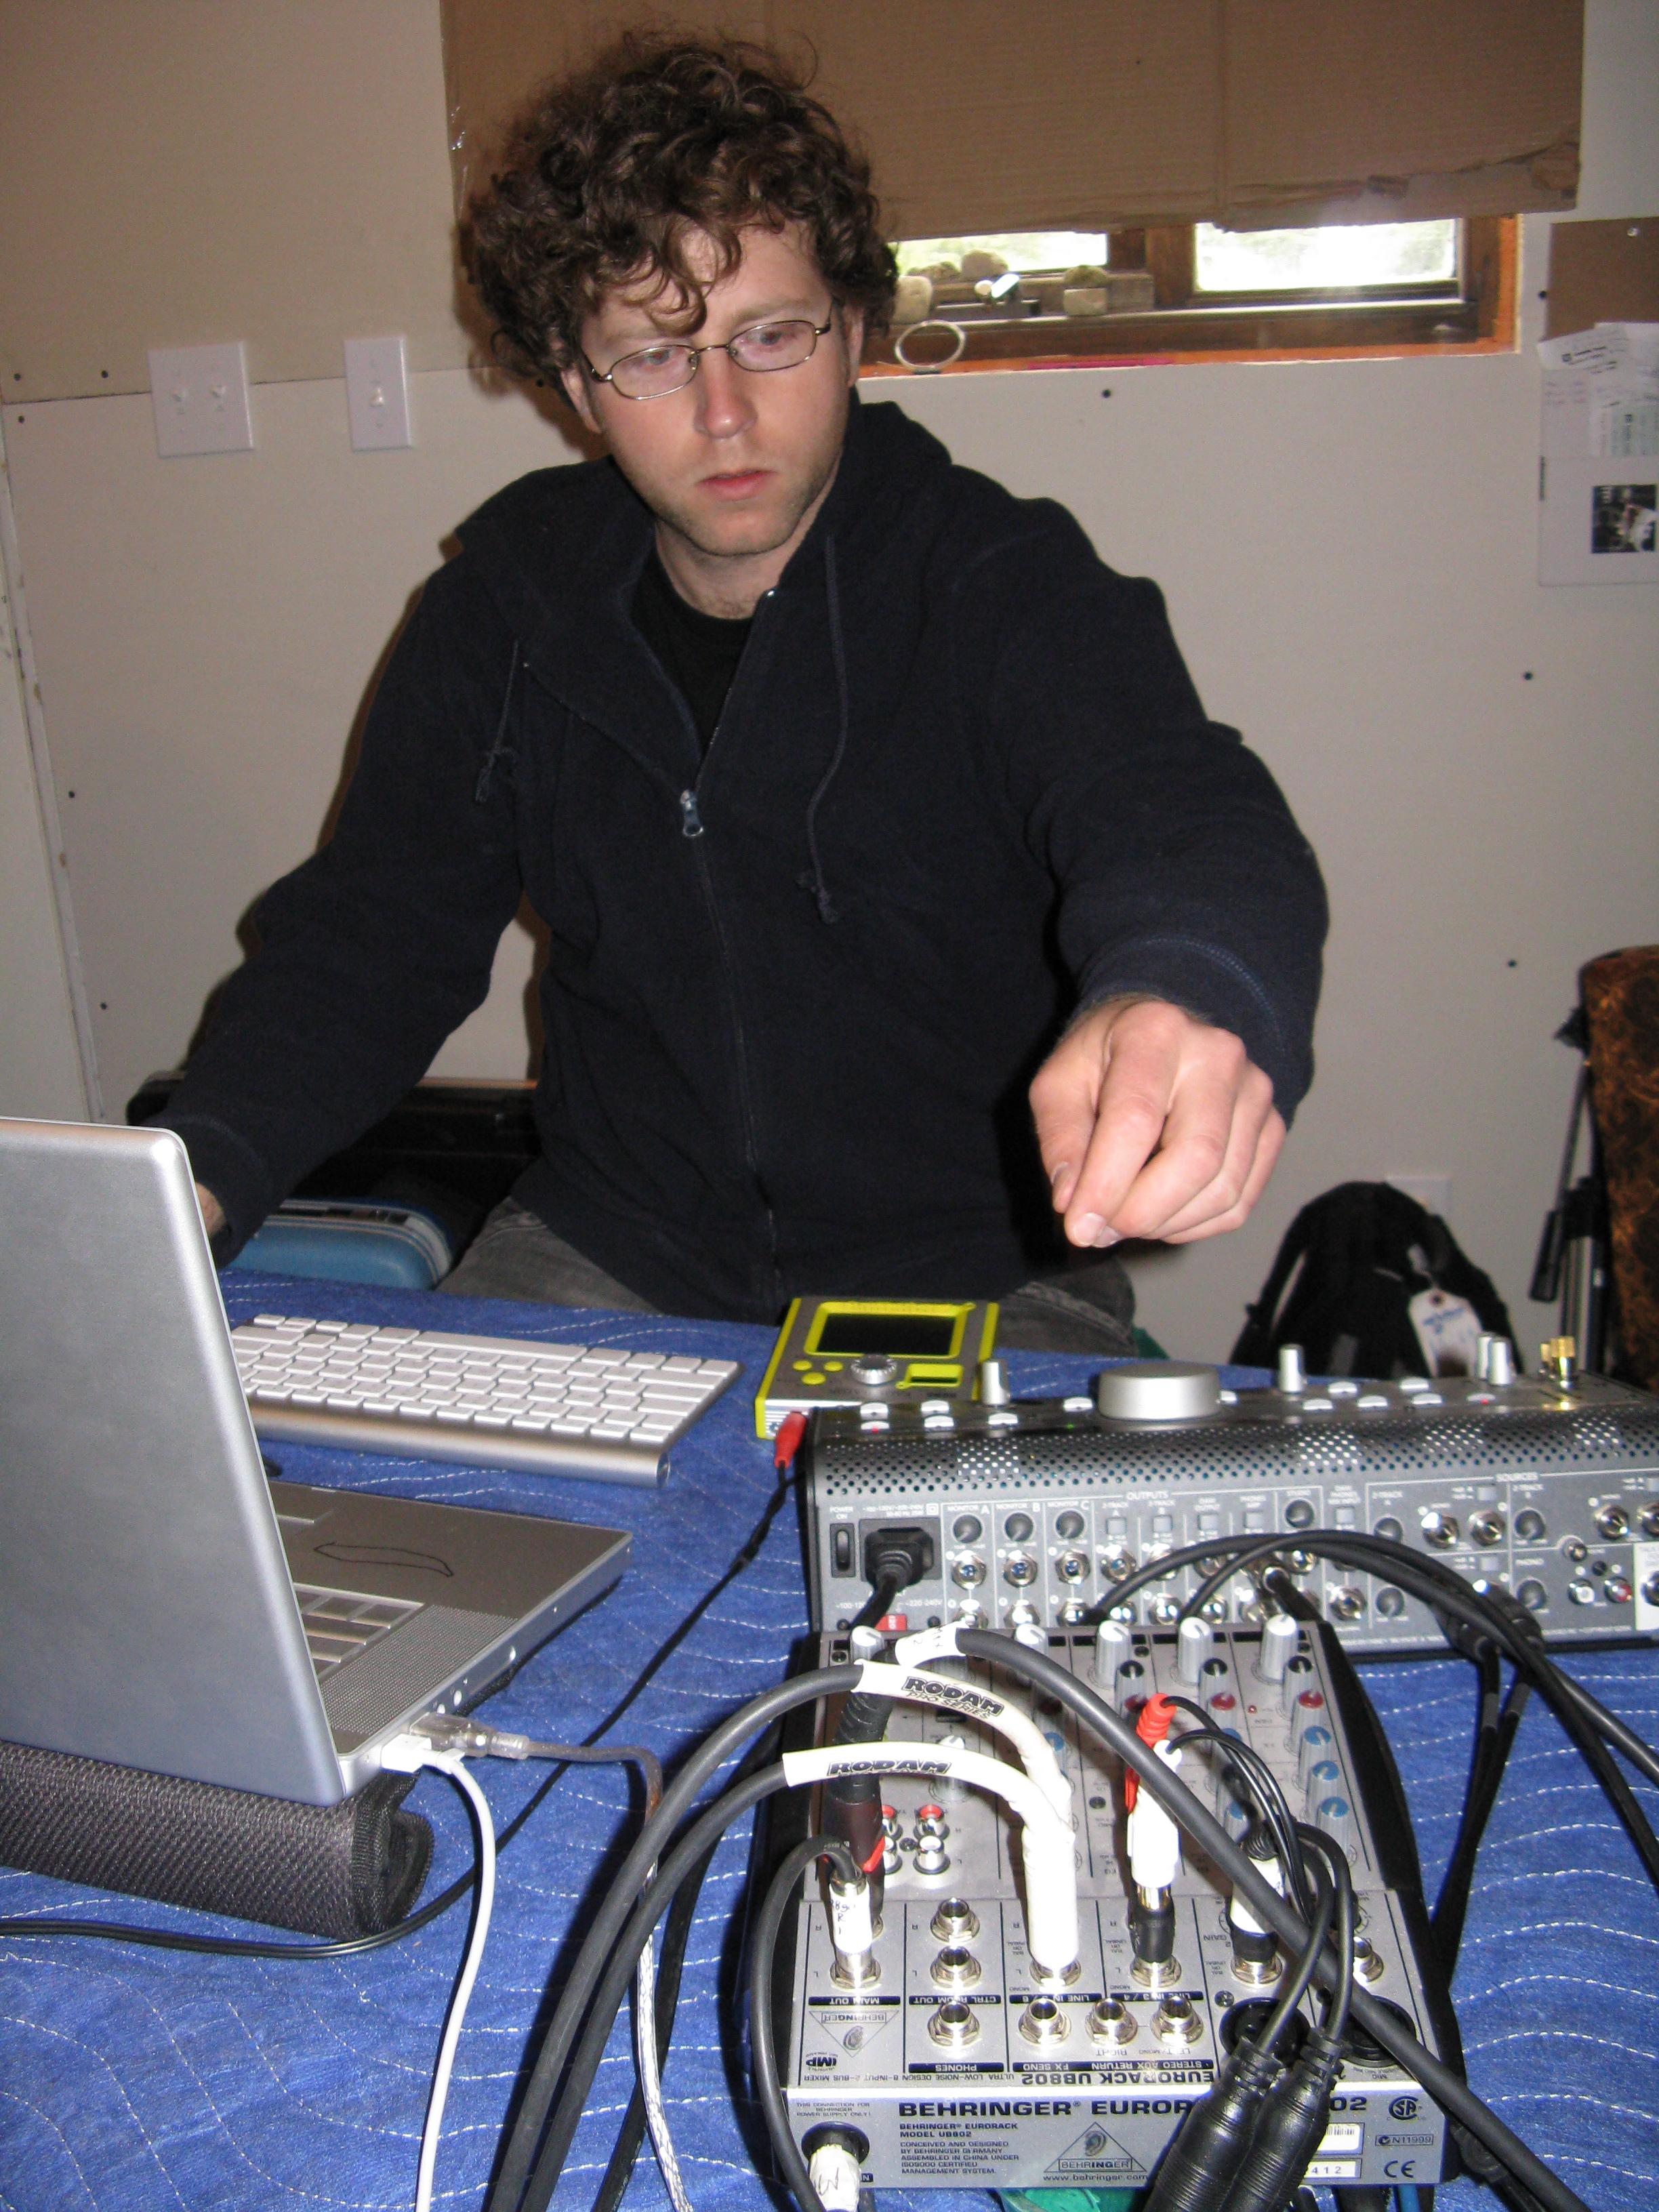 Jordy making music for Cam & Legs